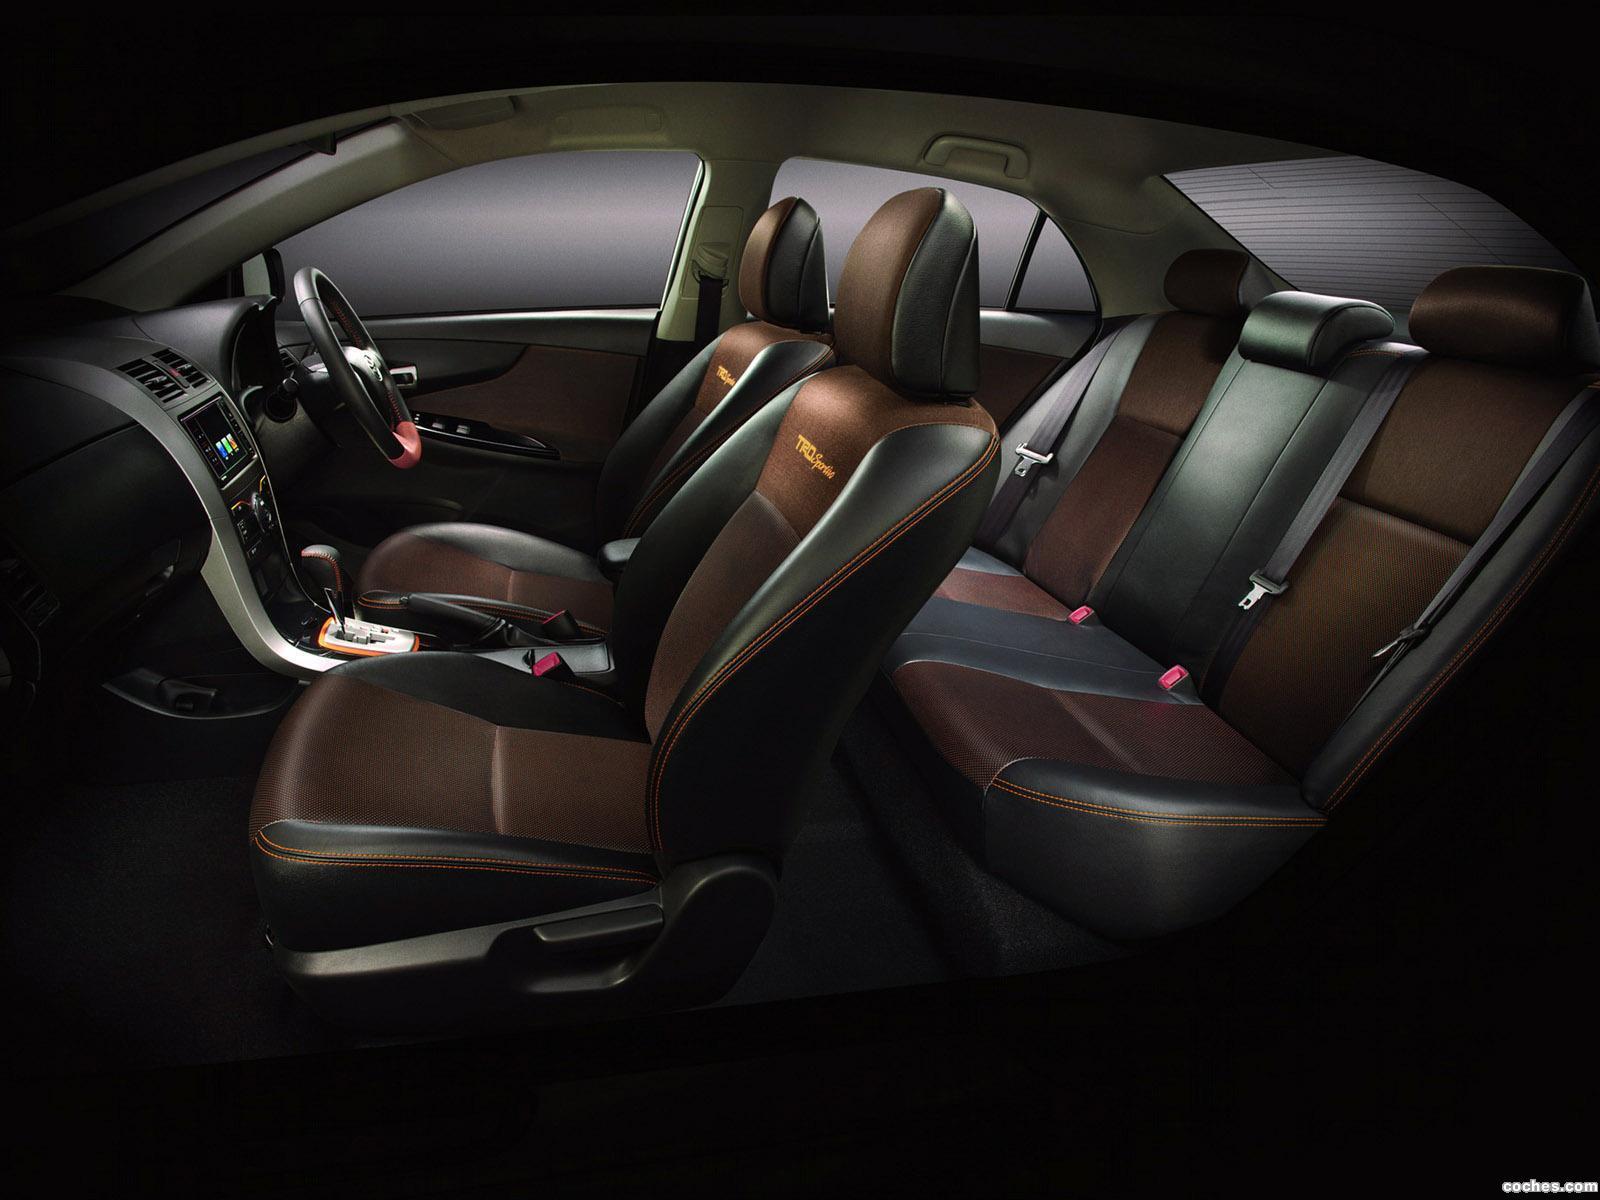 Foto 2 de Toyota Corolla Altis 1.8 TRD Sportivo 2013